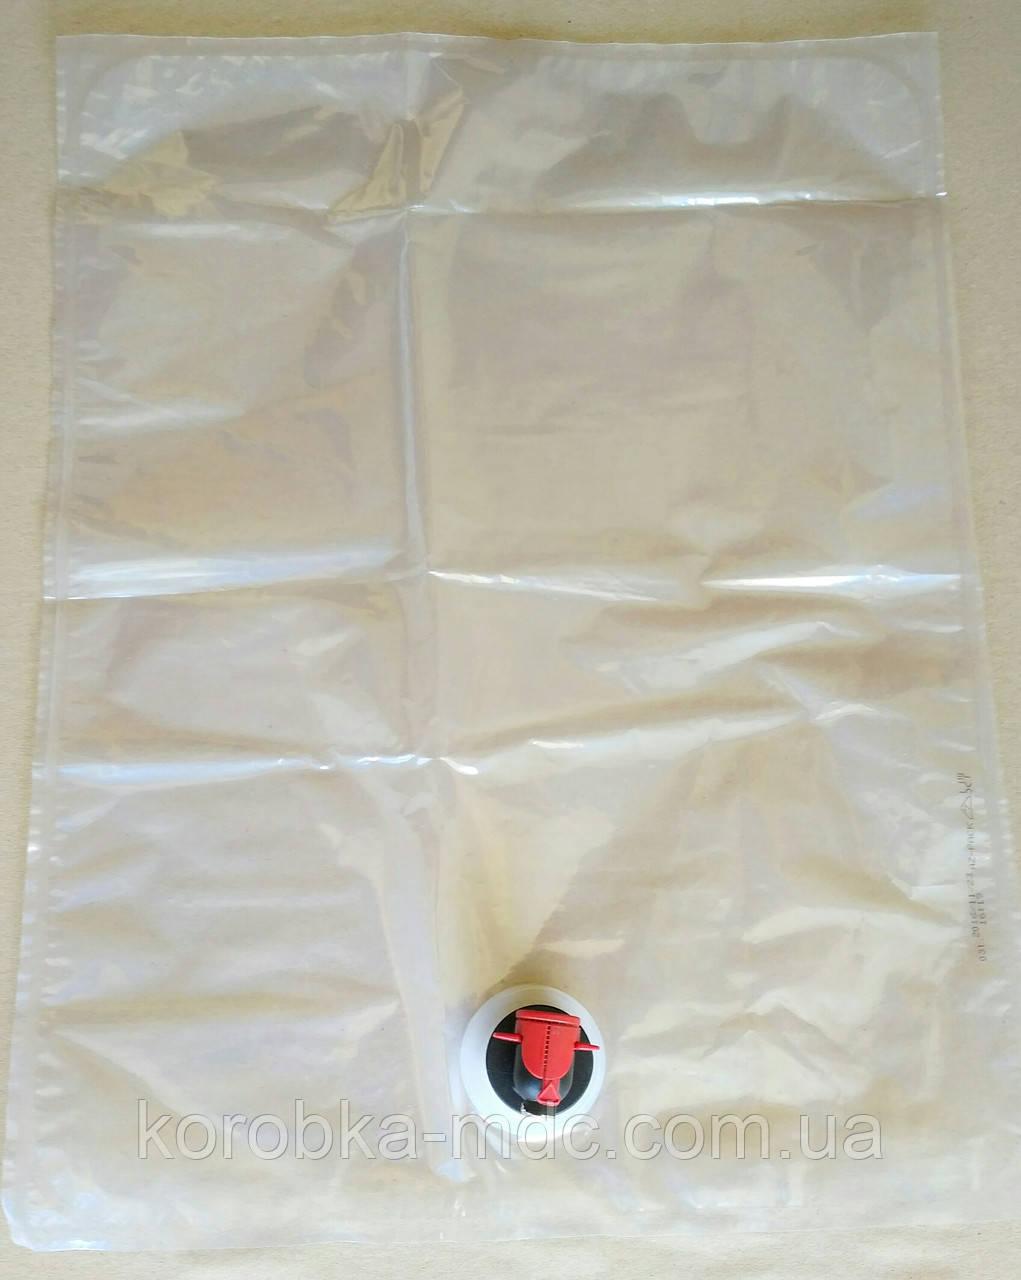 Пакет Bag in box 10L К_прозор